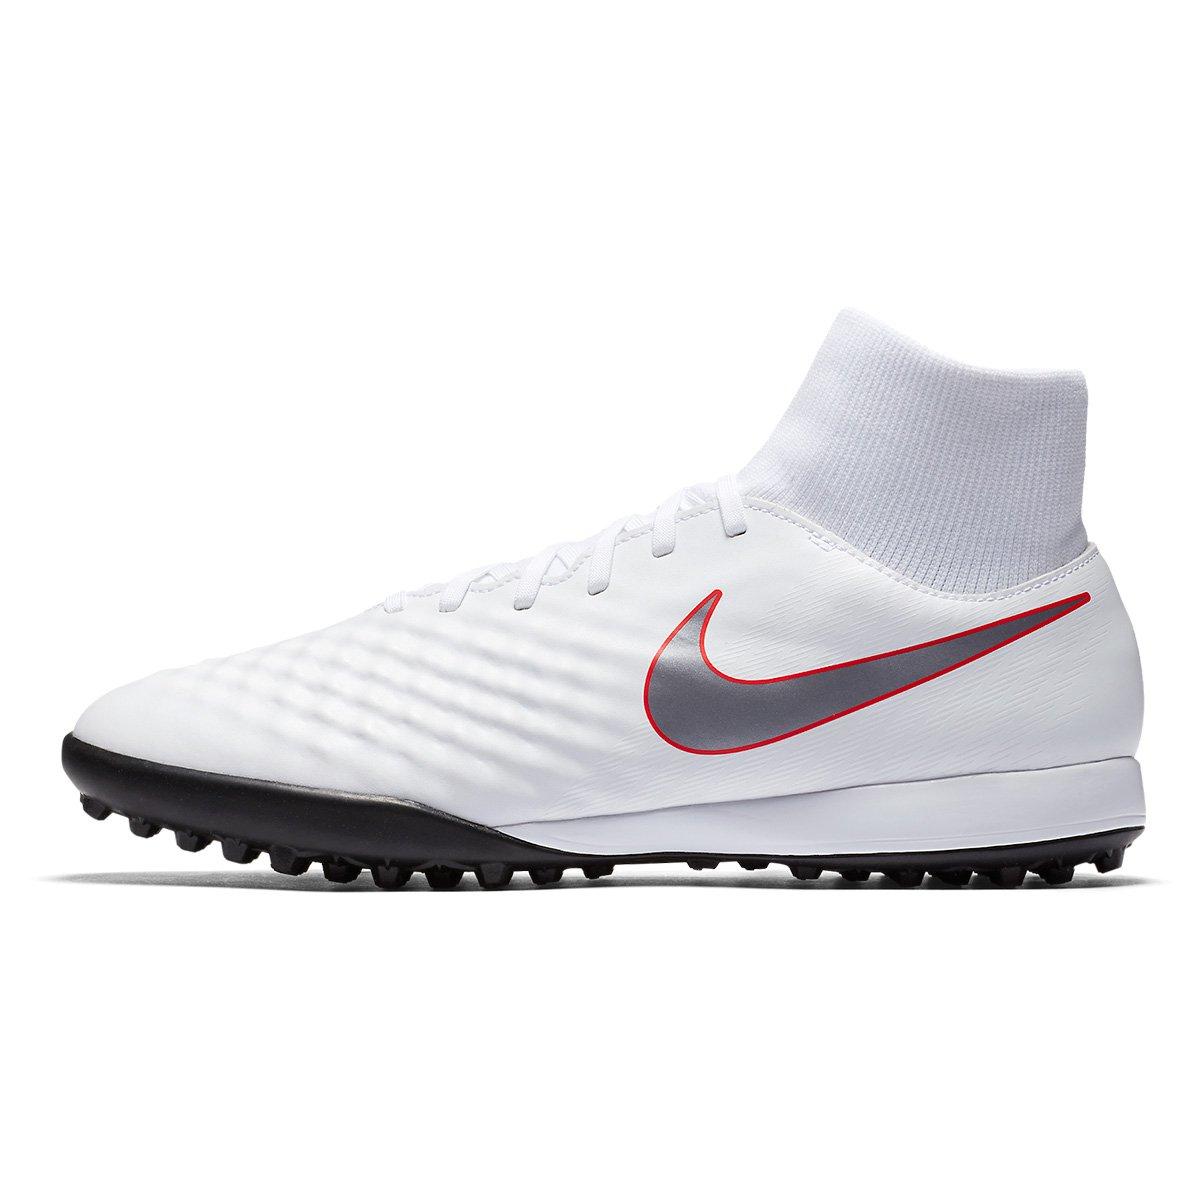 Chuteira Society Nike Magista Obra 2 Academy Dinamic Fit Masculina . efe41a4b62b29